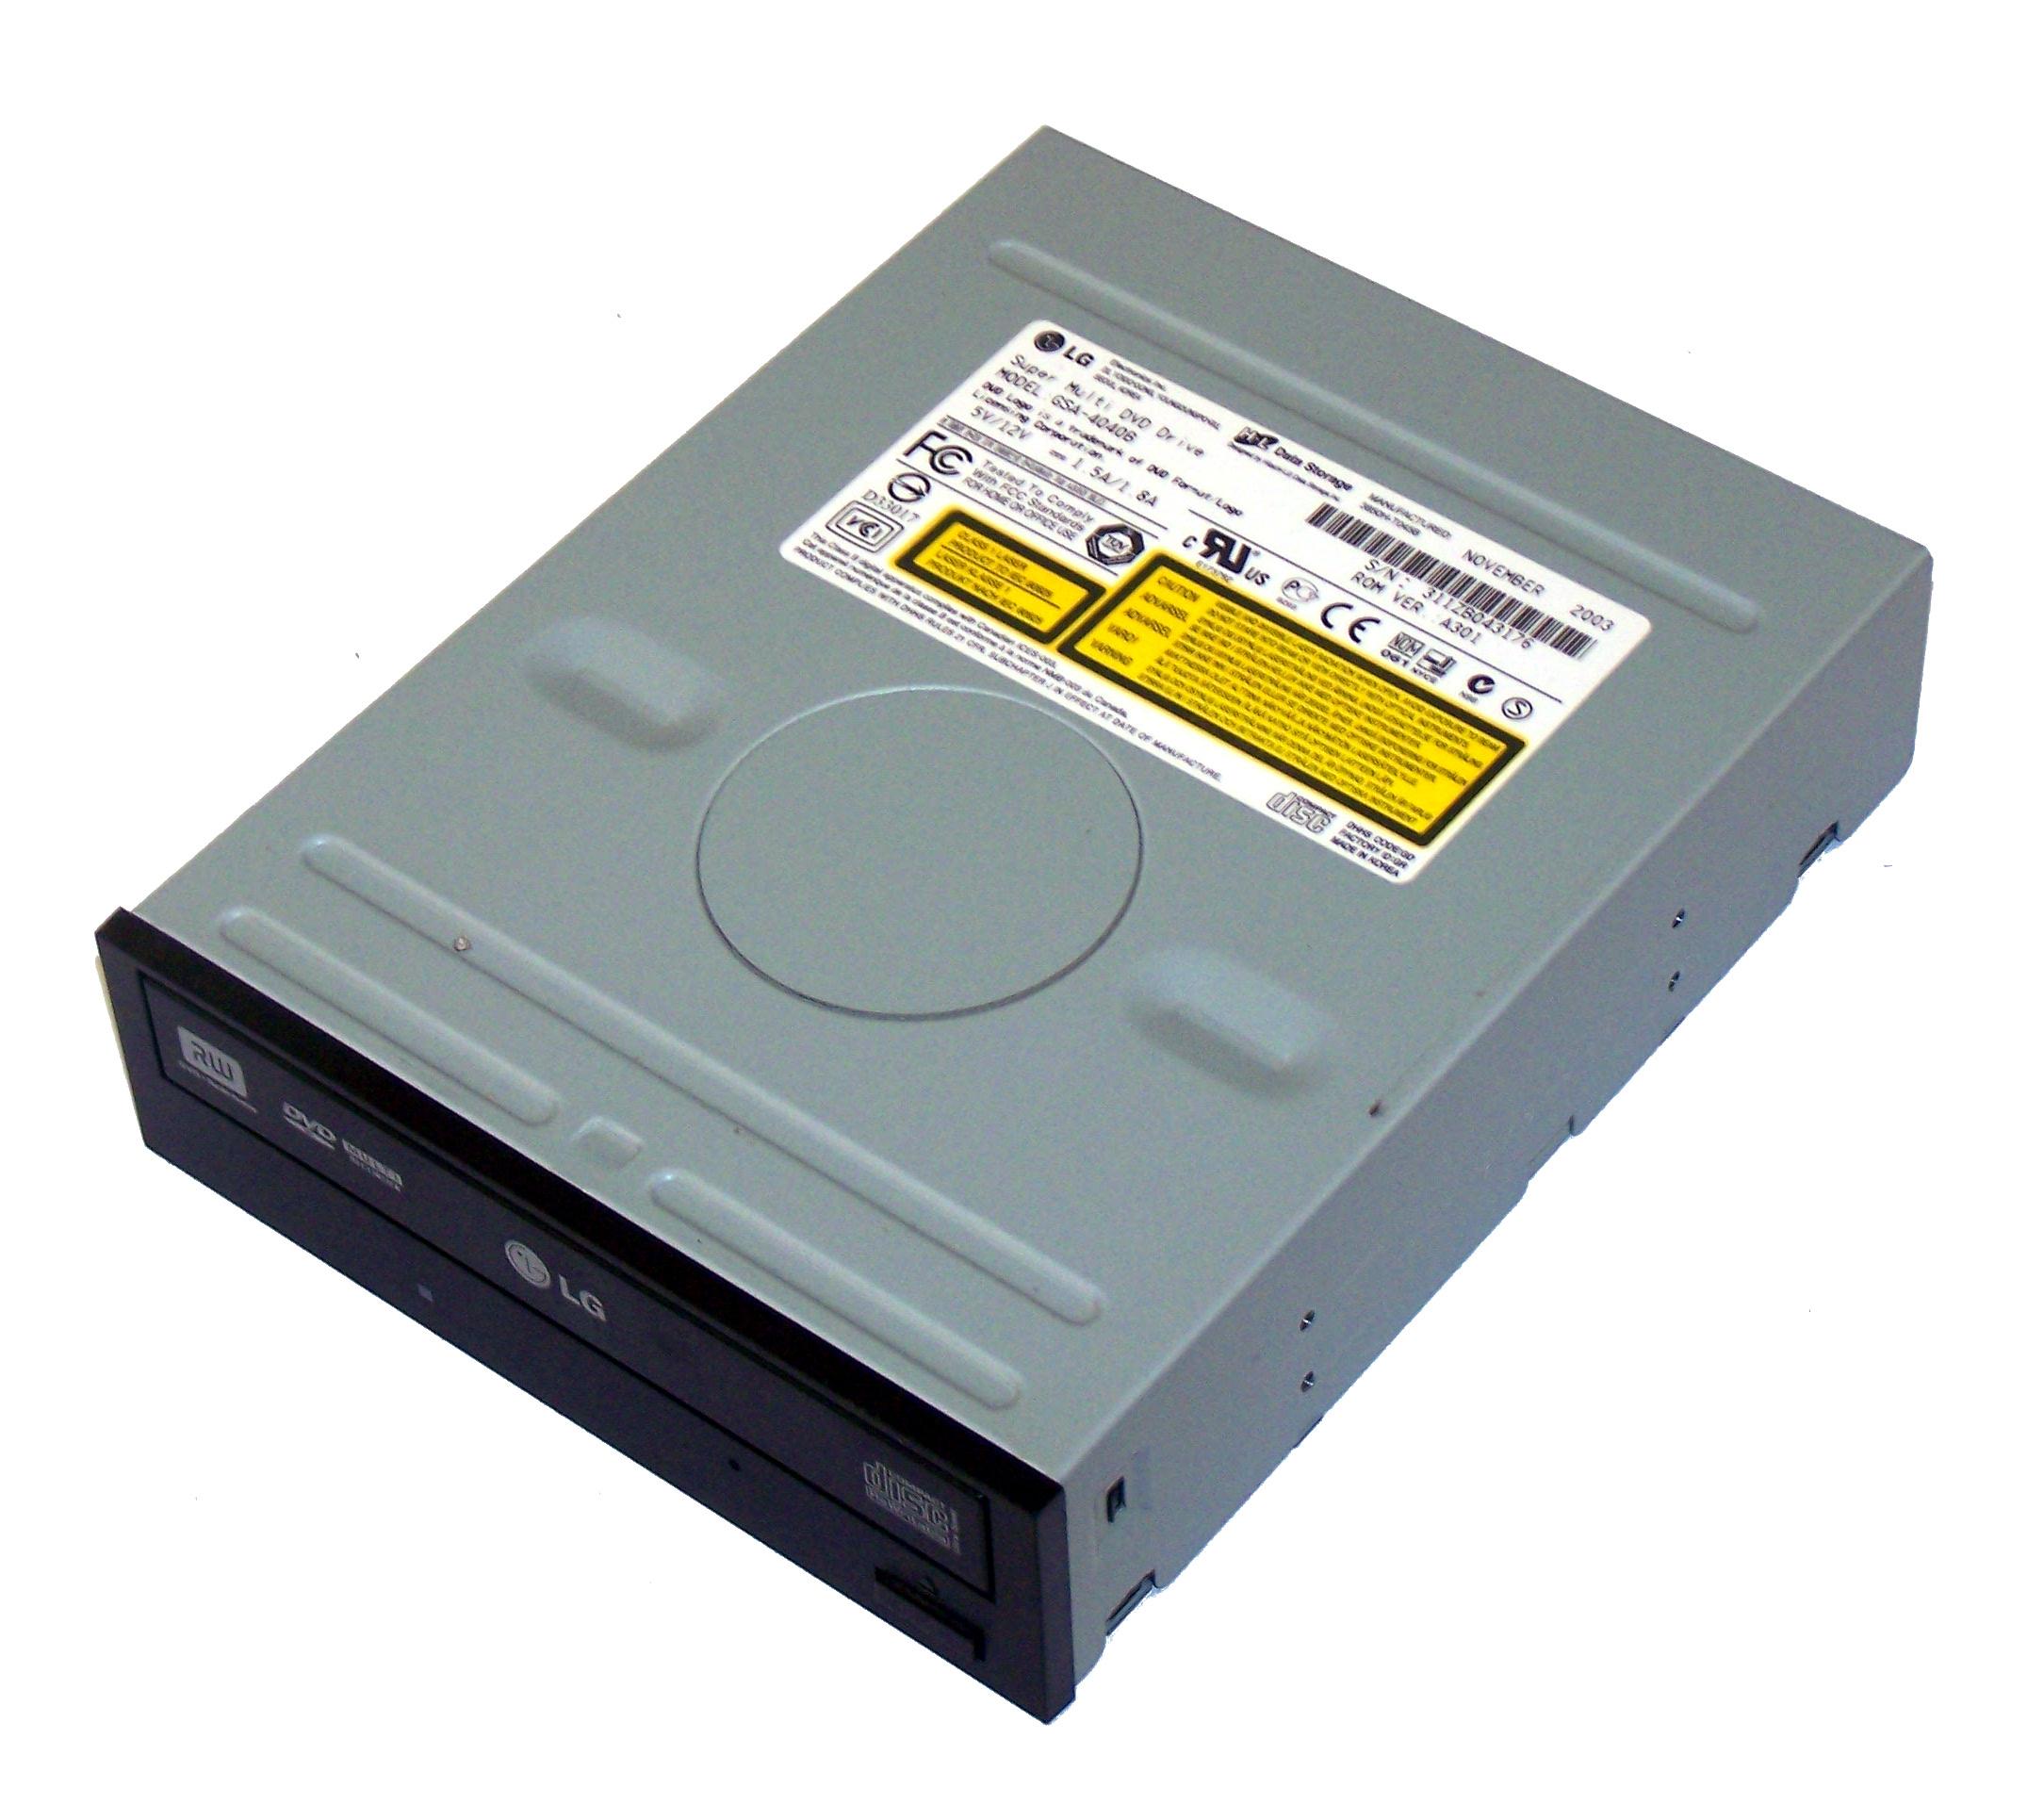 HL Data LG GSA-4040B Black Bezel ATA H/H DVD-RW Super Multi Drive